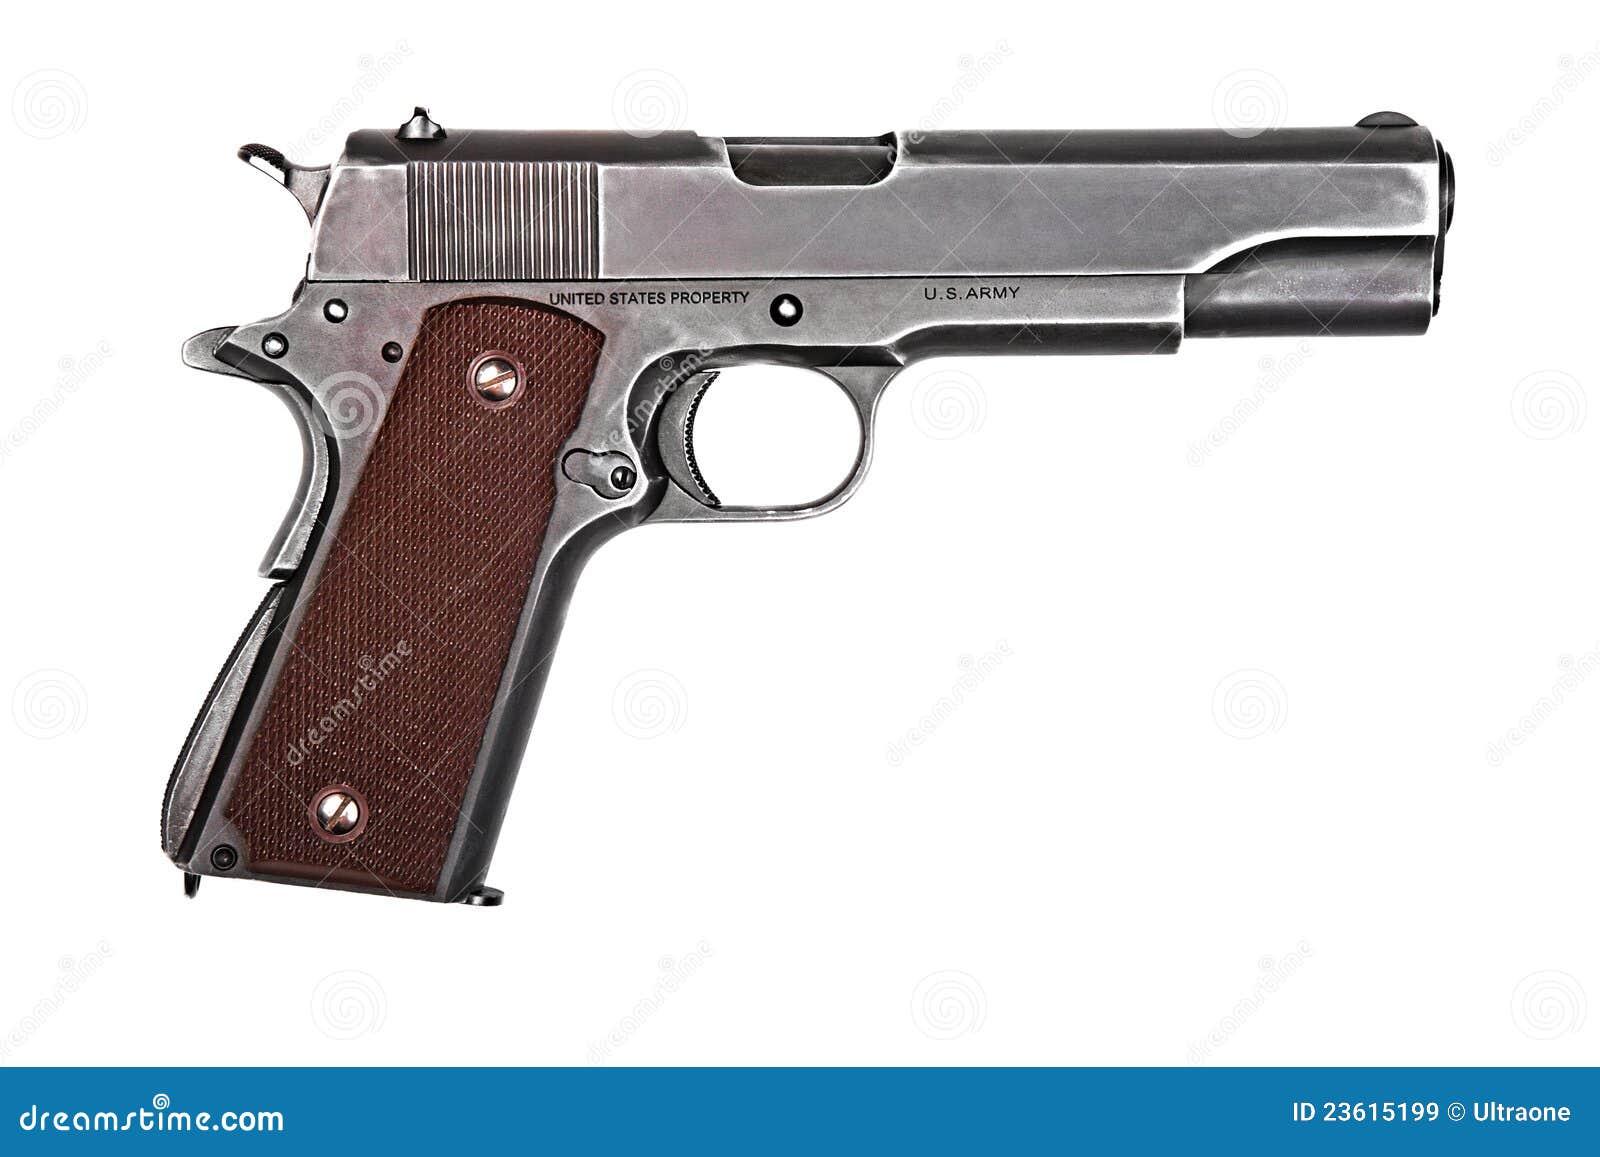 Legendary U.S. Army Handgun. Stock Image - Image: 23615199